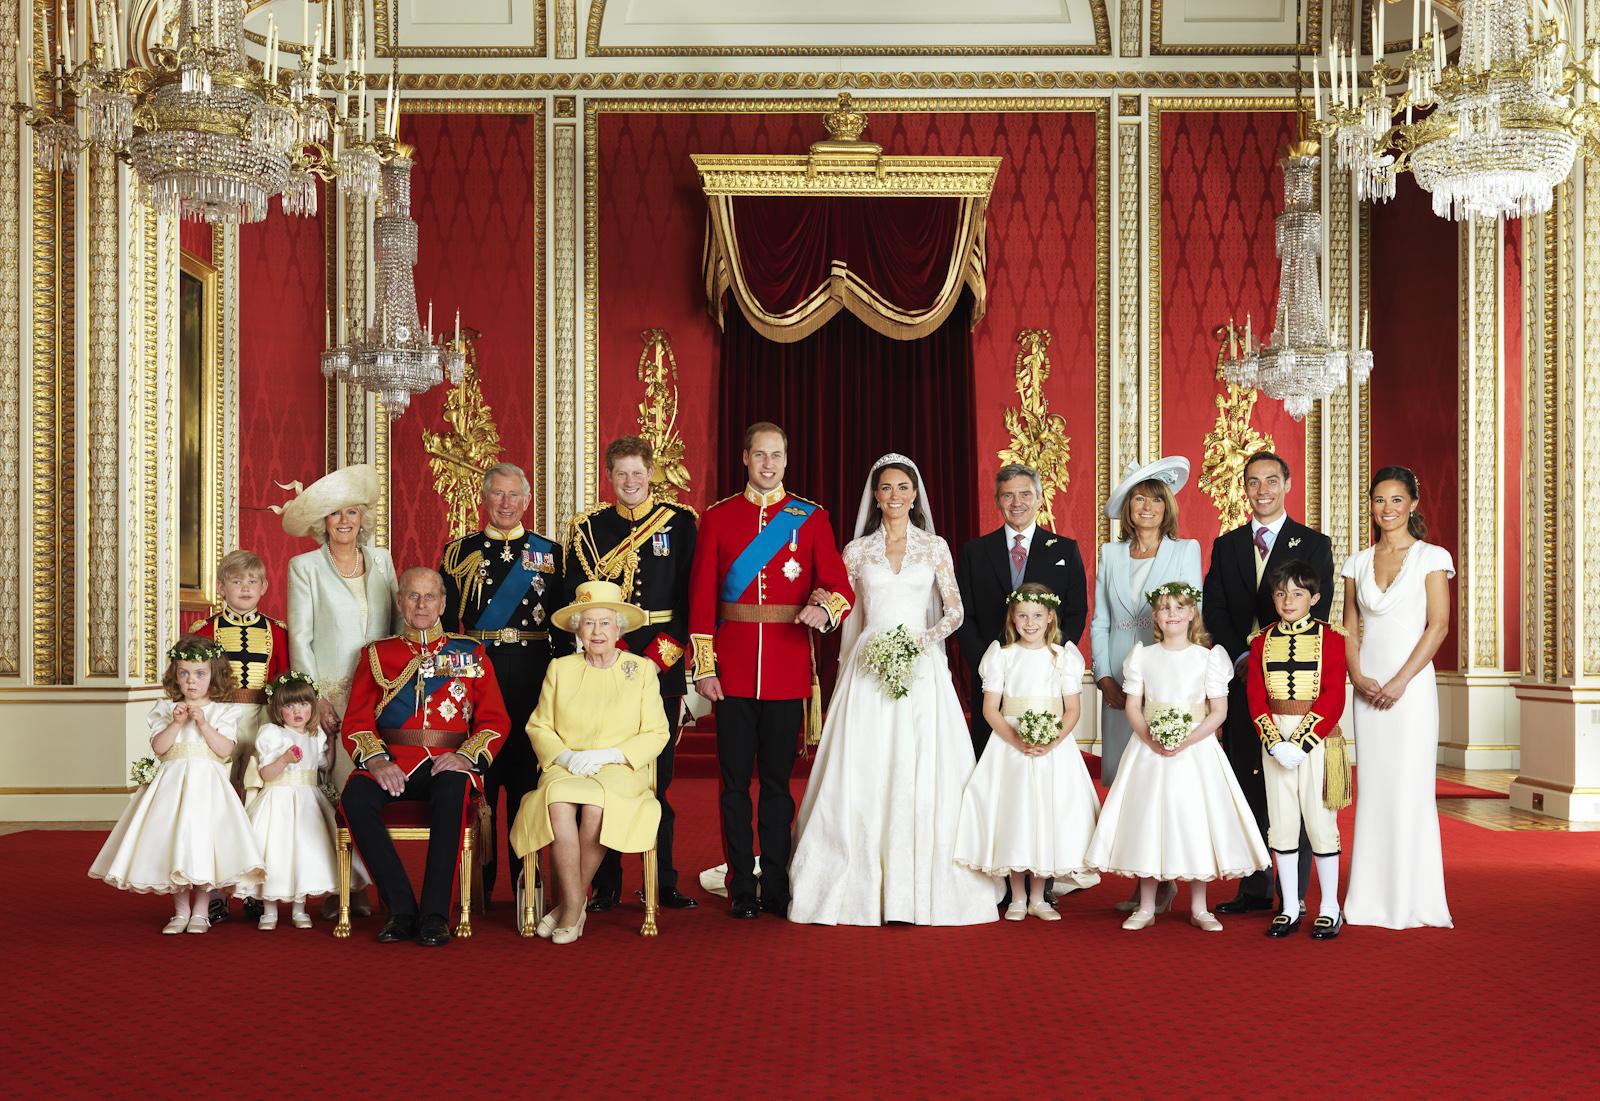 The Royal Wedding Dress Code: Uniforms, Morning Coats, or Lounge ...